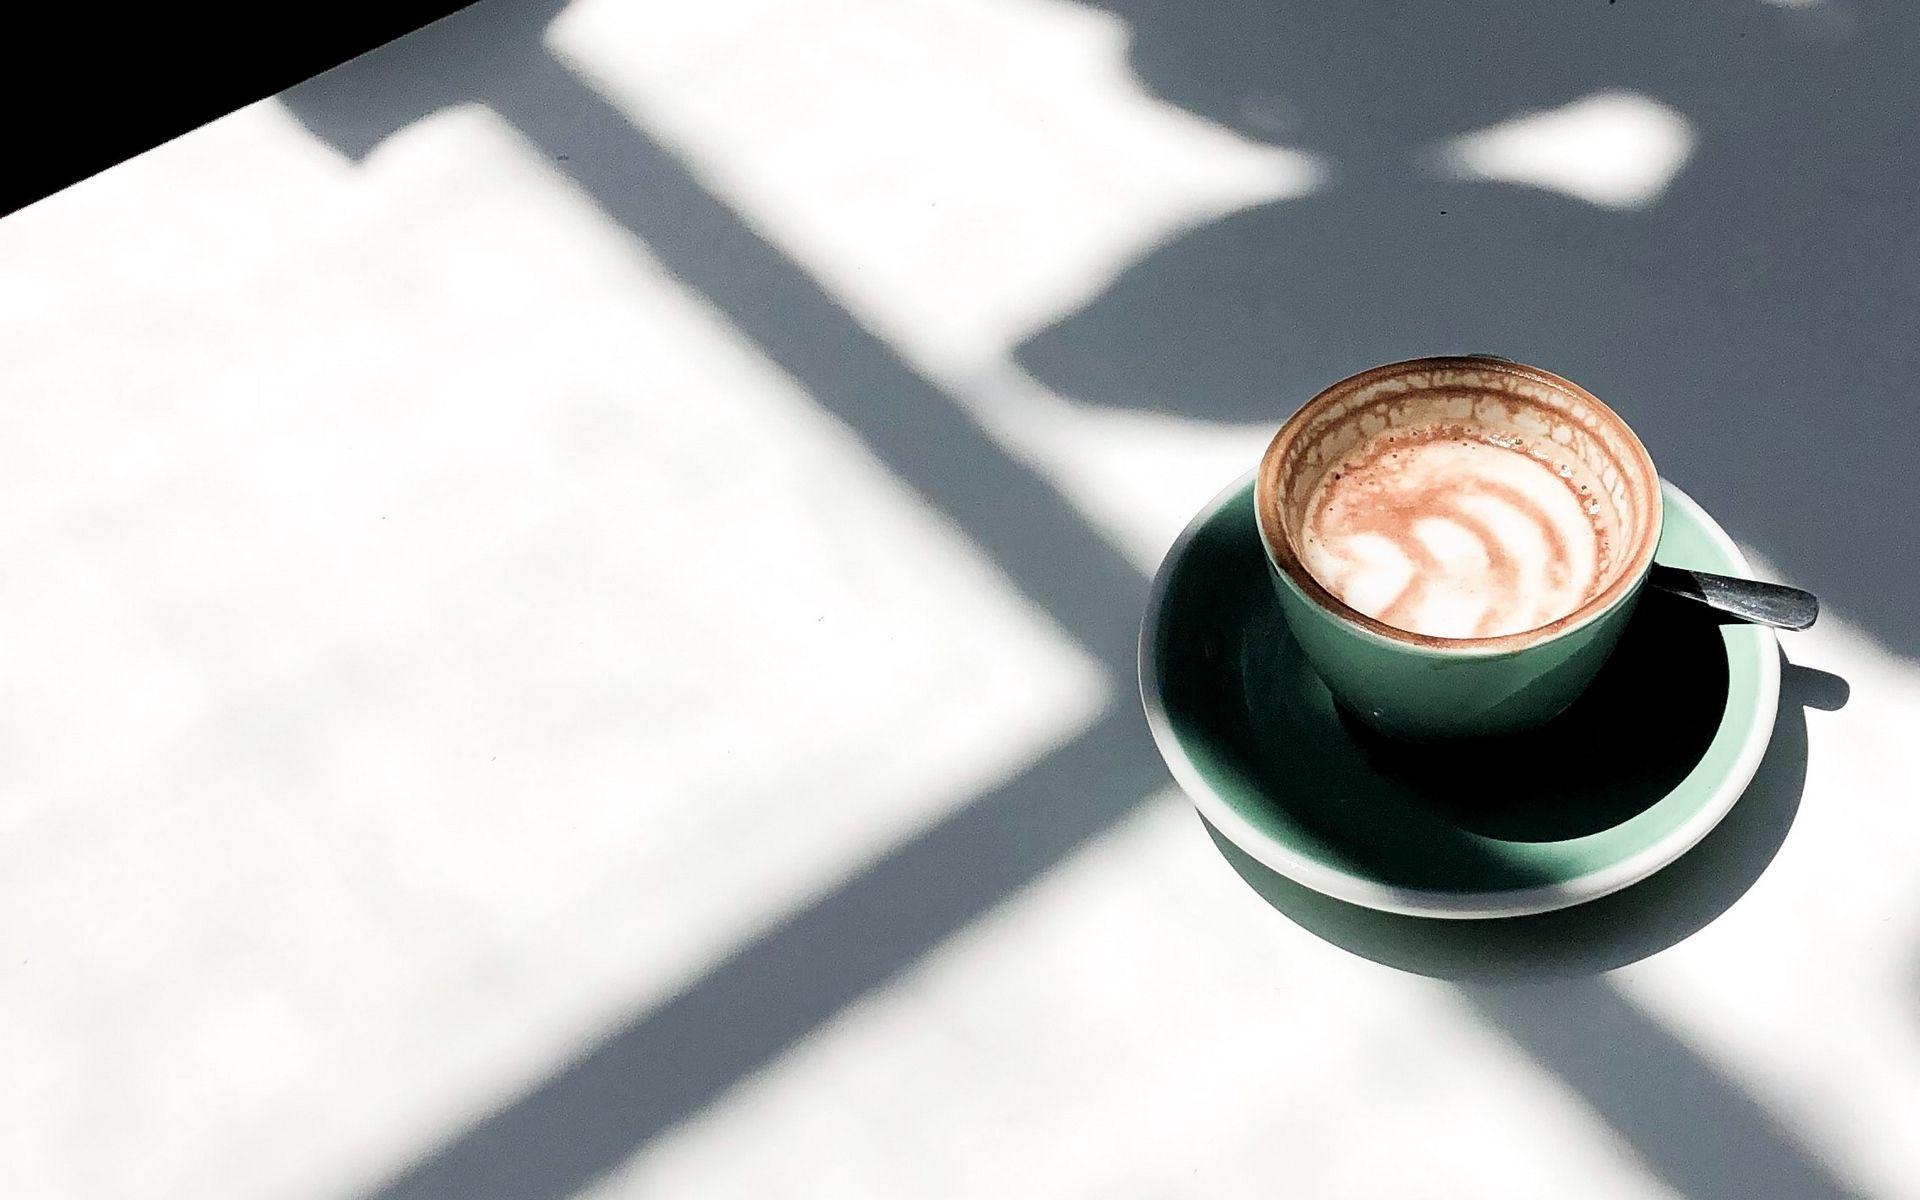 A Cup Of Coffee Hd Wallpaper Wallpaper Coffee Cups Coffee Wallpaper